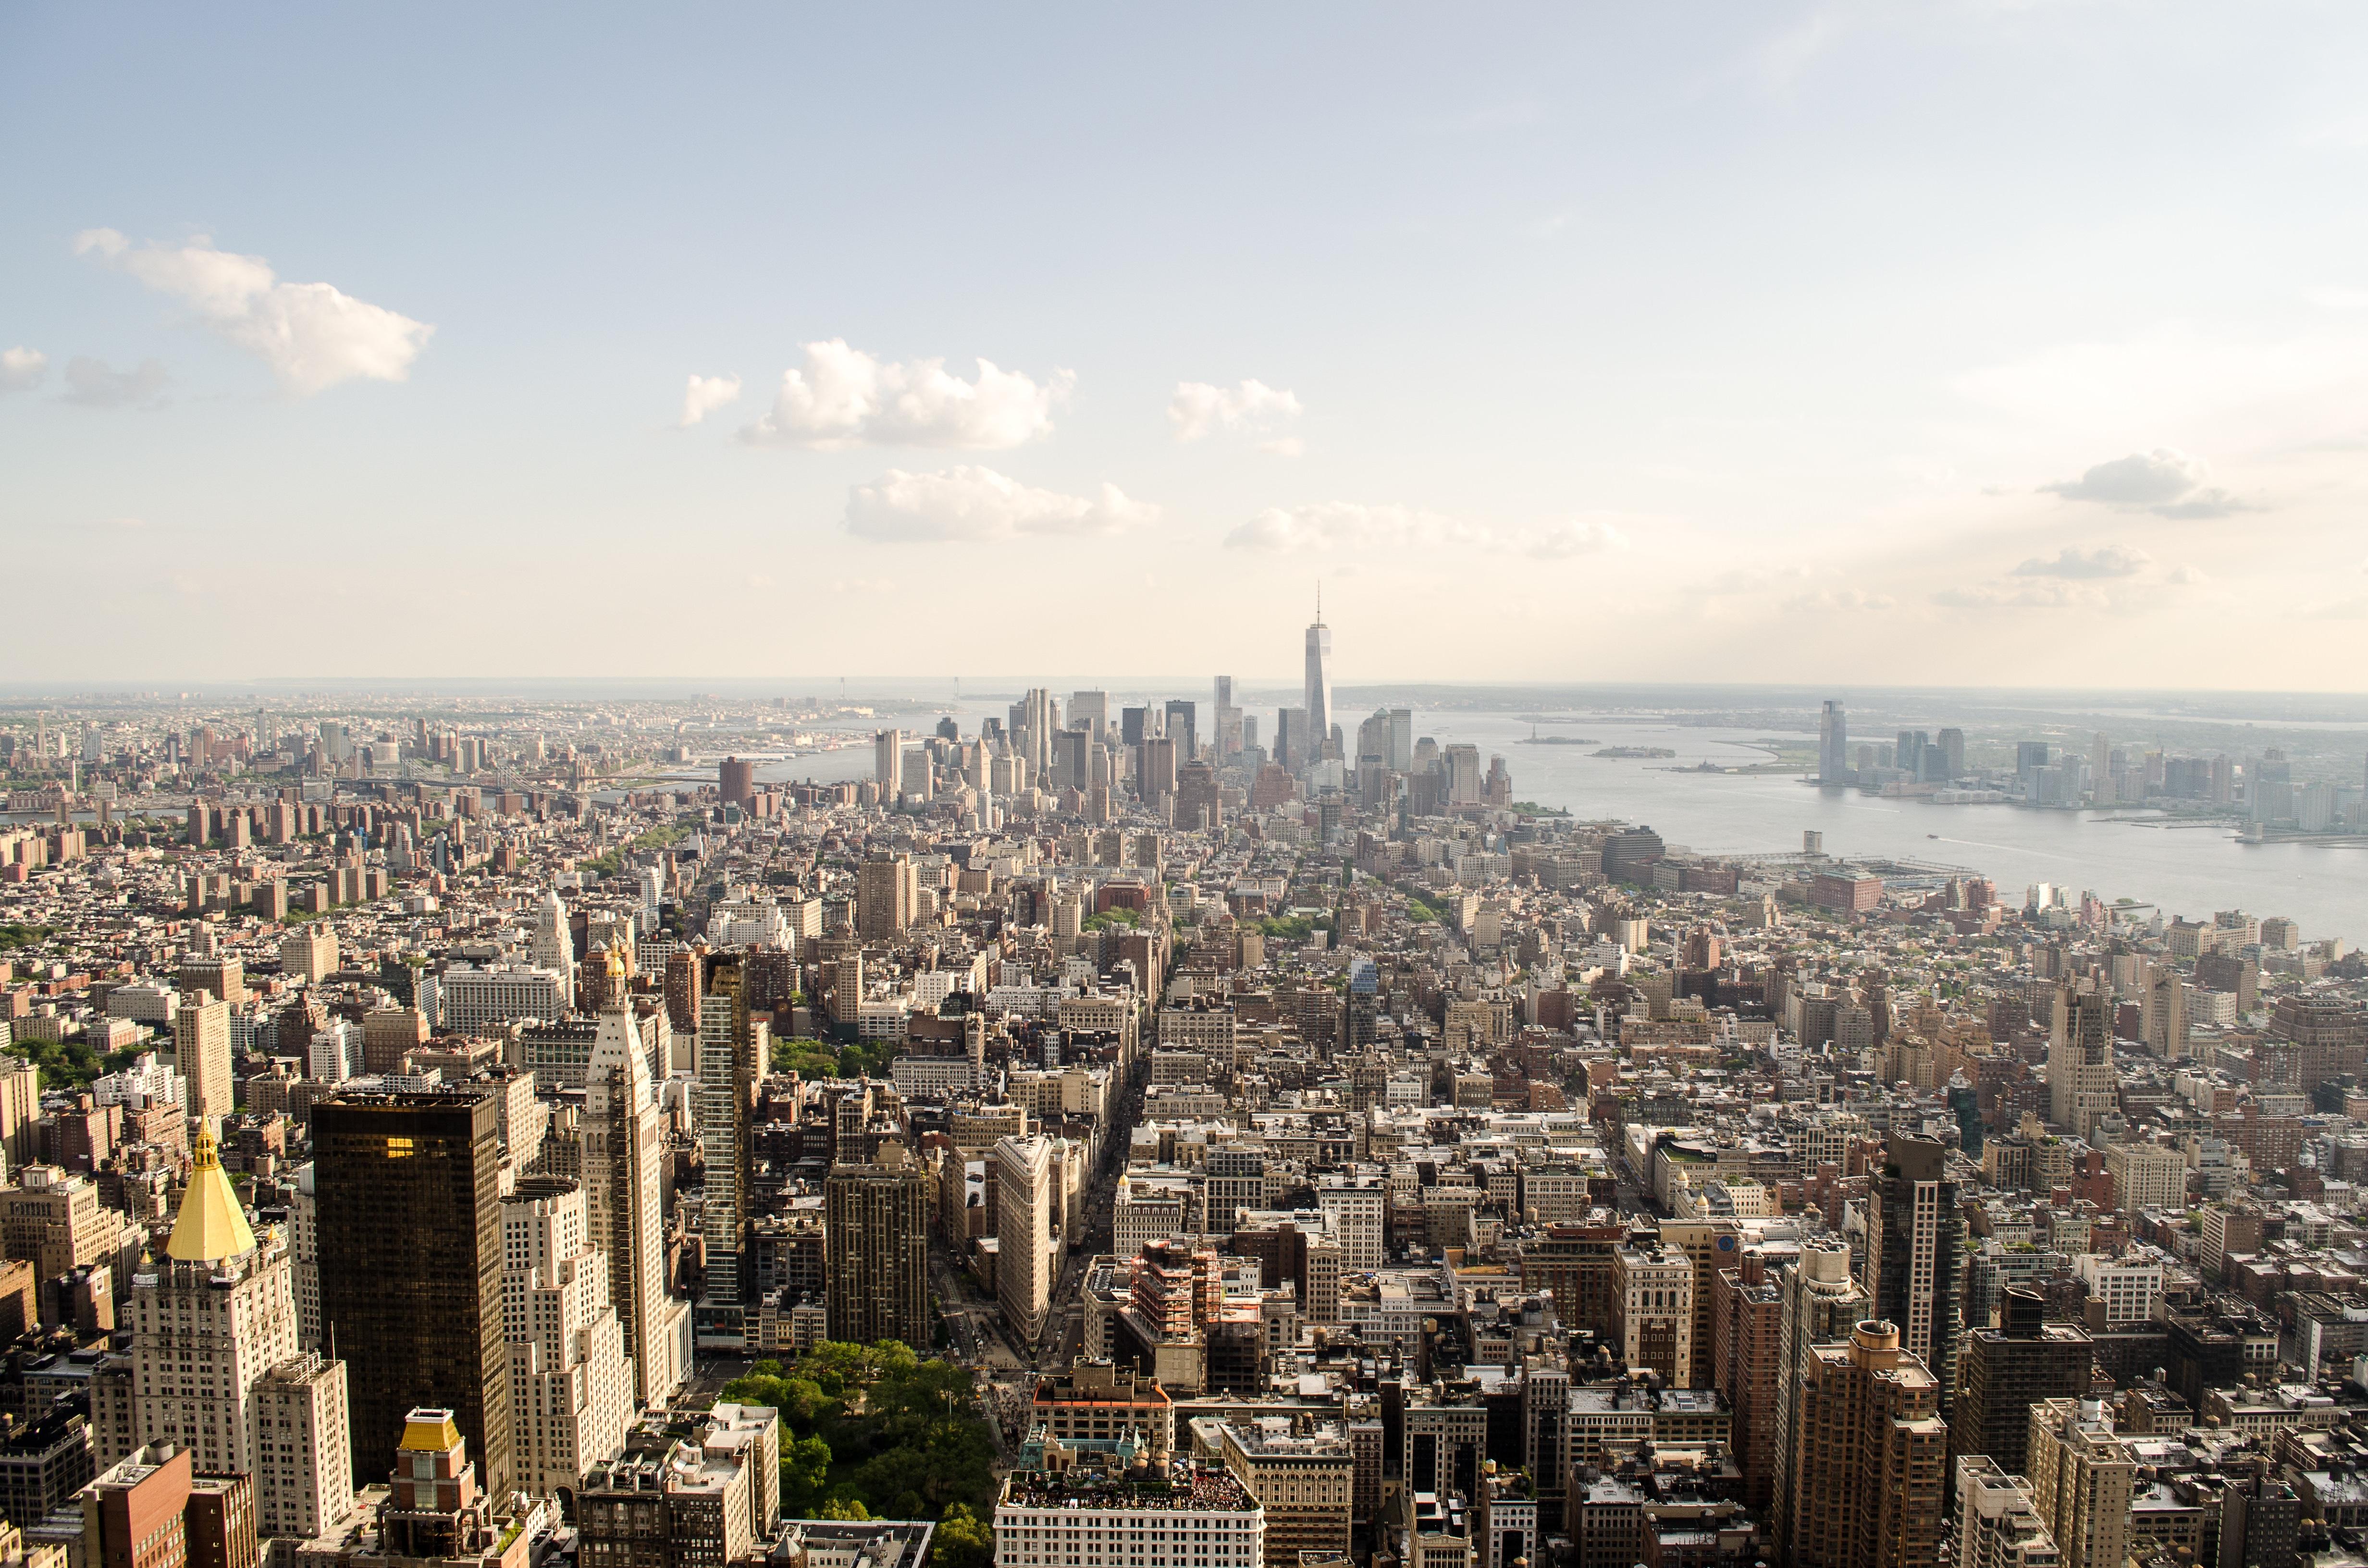 Cities Skyline List  Servece Buildings